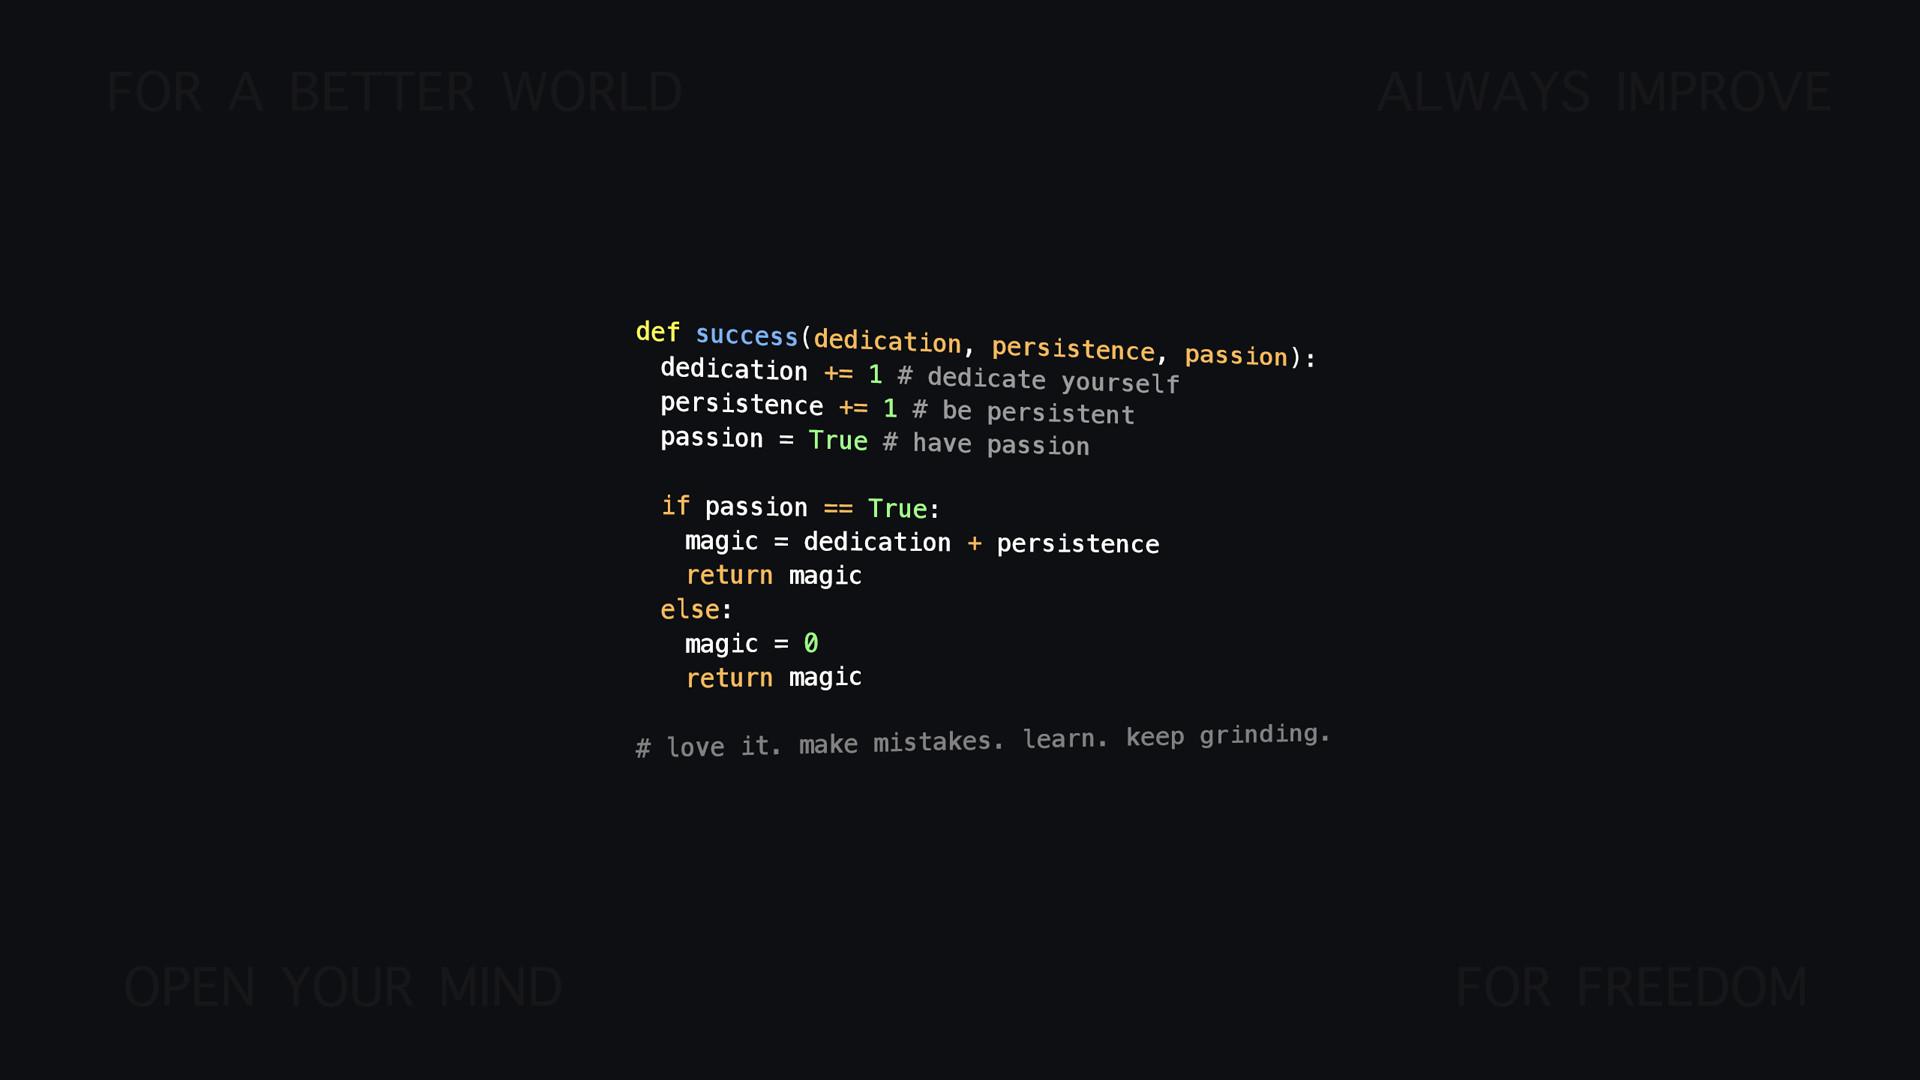 motivational Python/programming wallpaper [1920×1080]. Let me know .